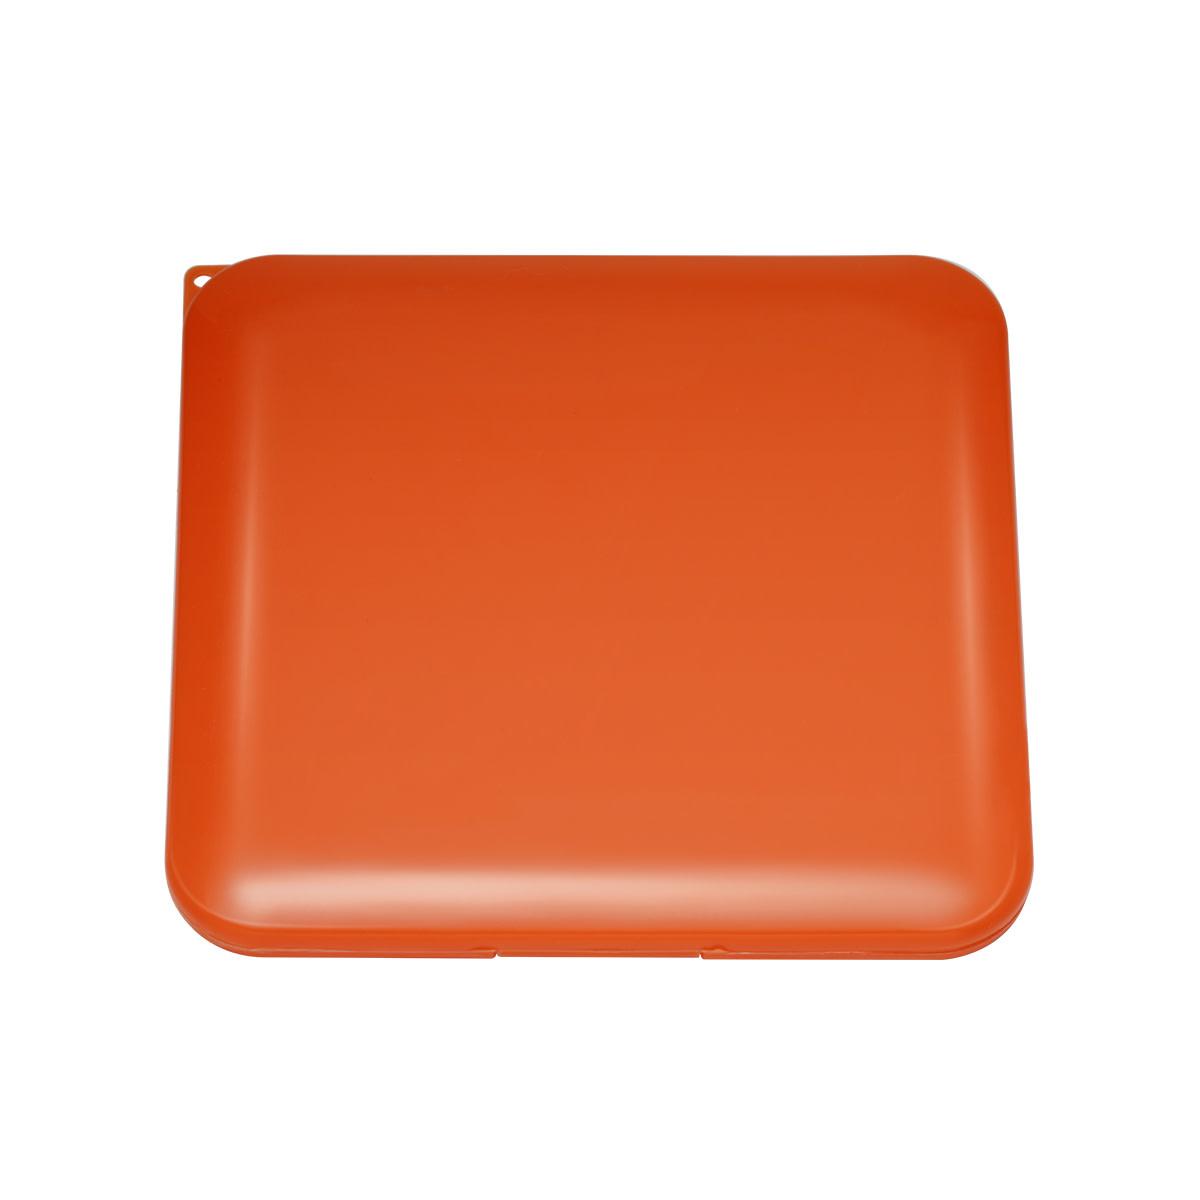 With love Portable face mask holder - orange